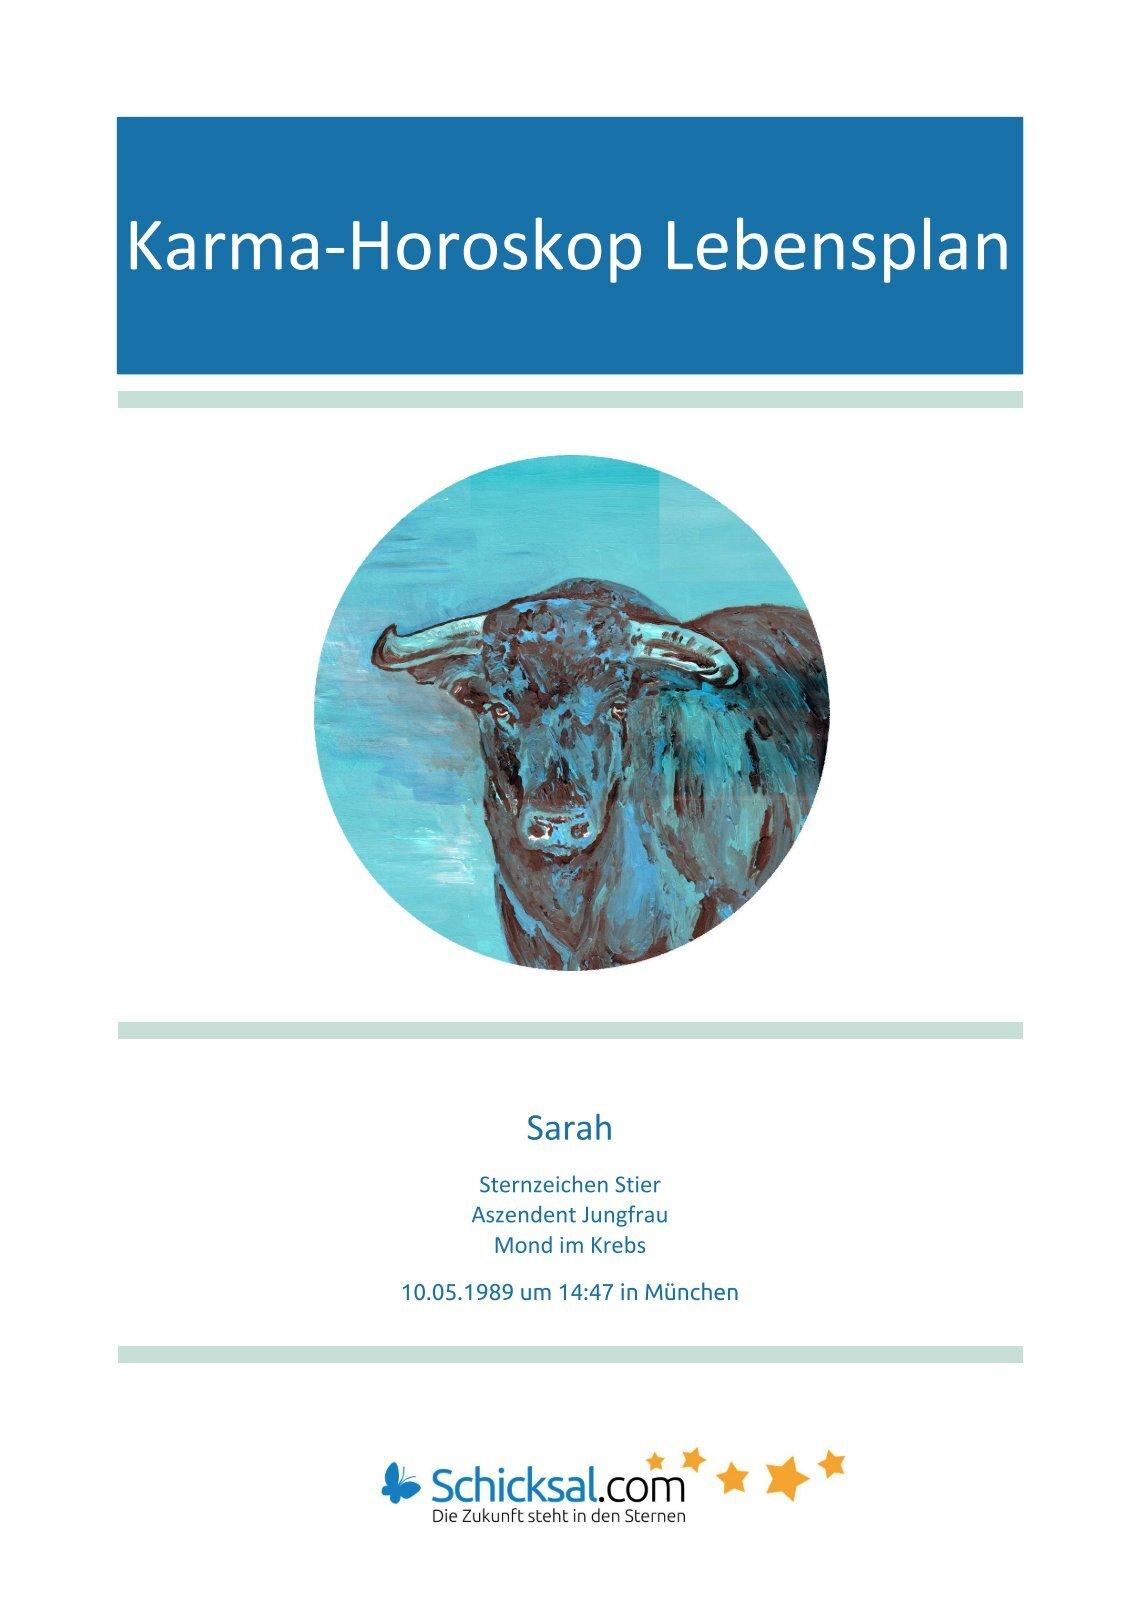 Karma-Horoskop Lebensplan Sarah